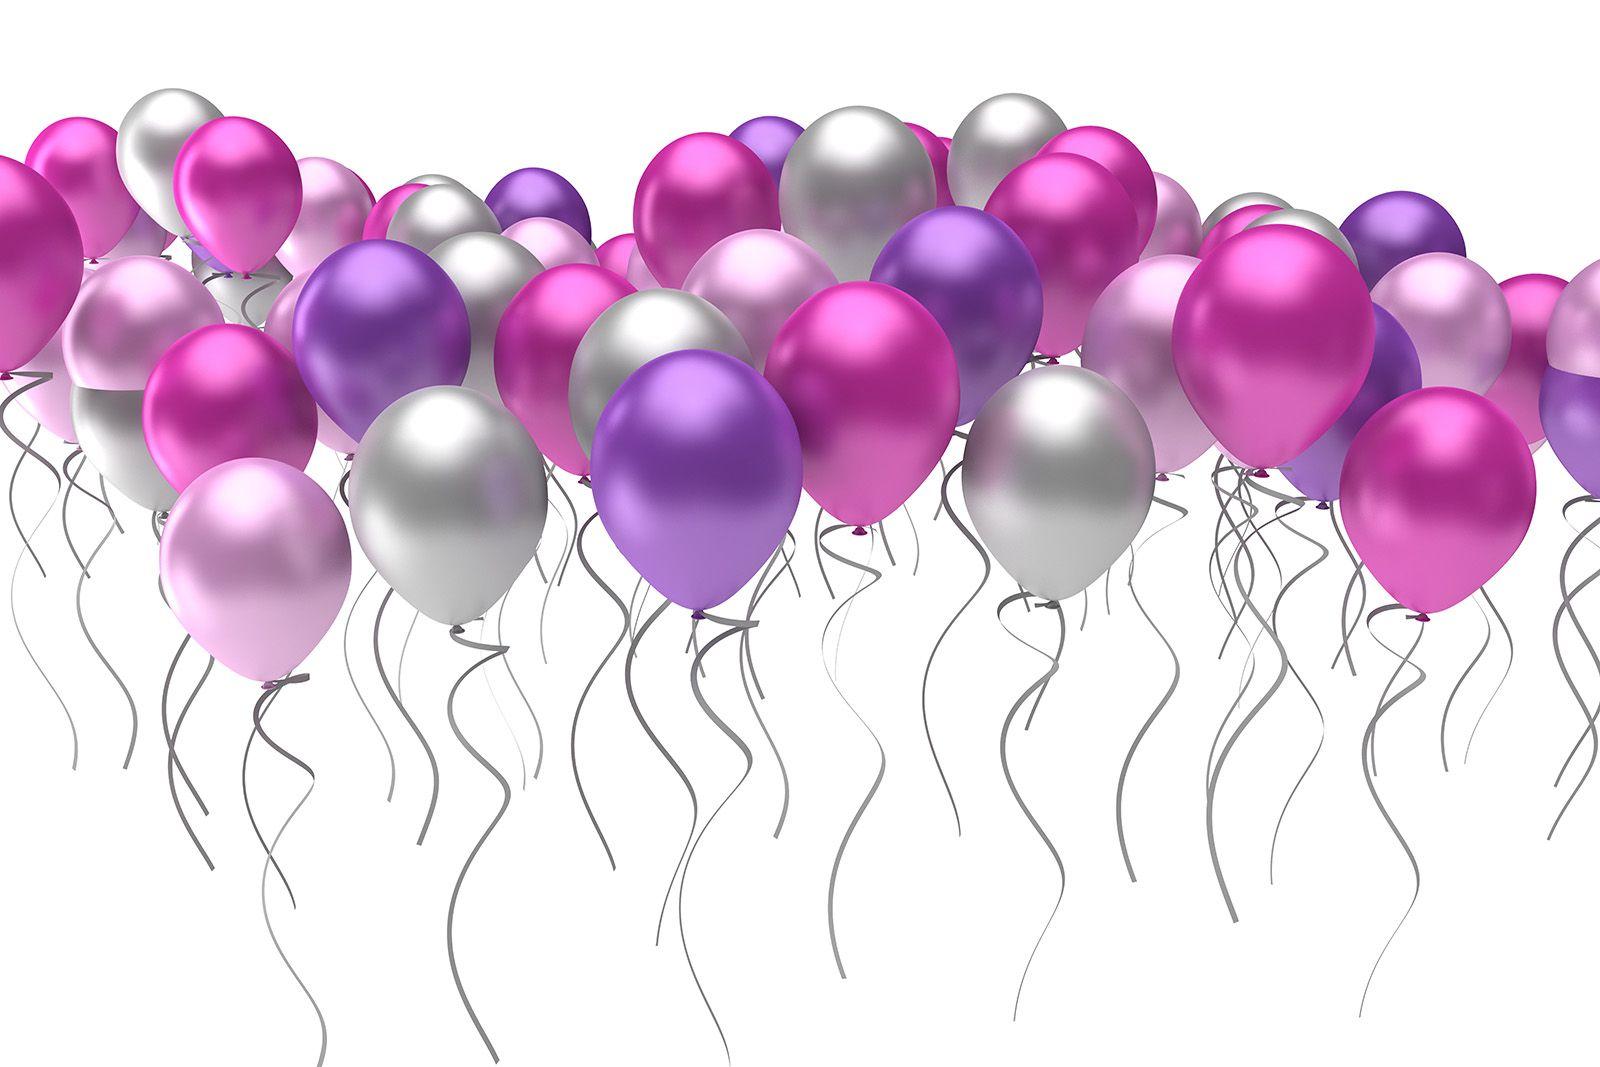 New Year Balloon Wallpaper